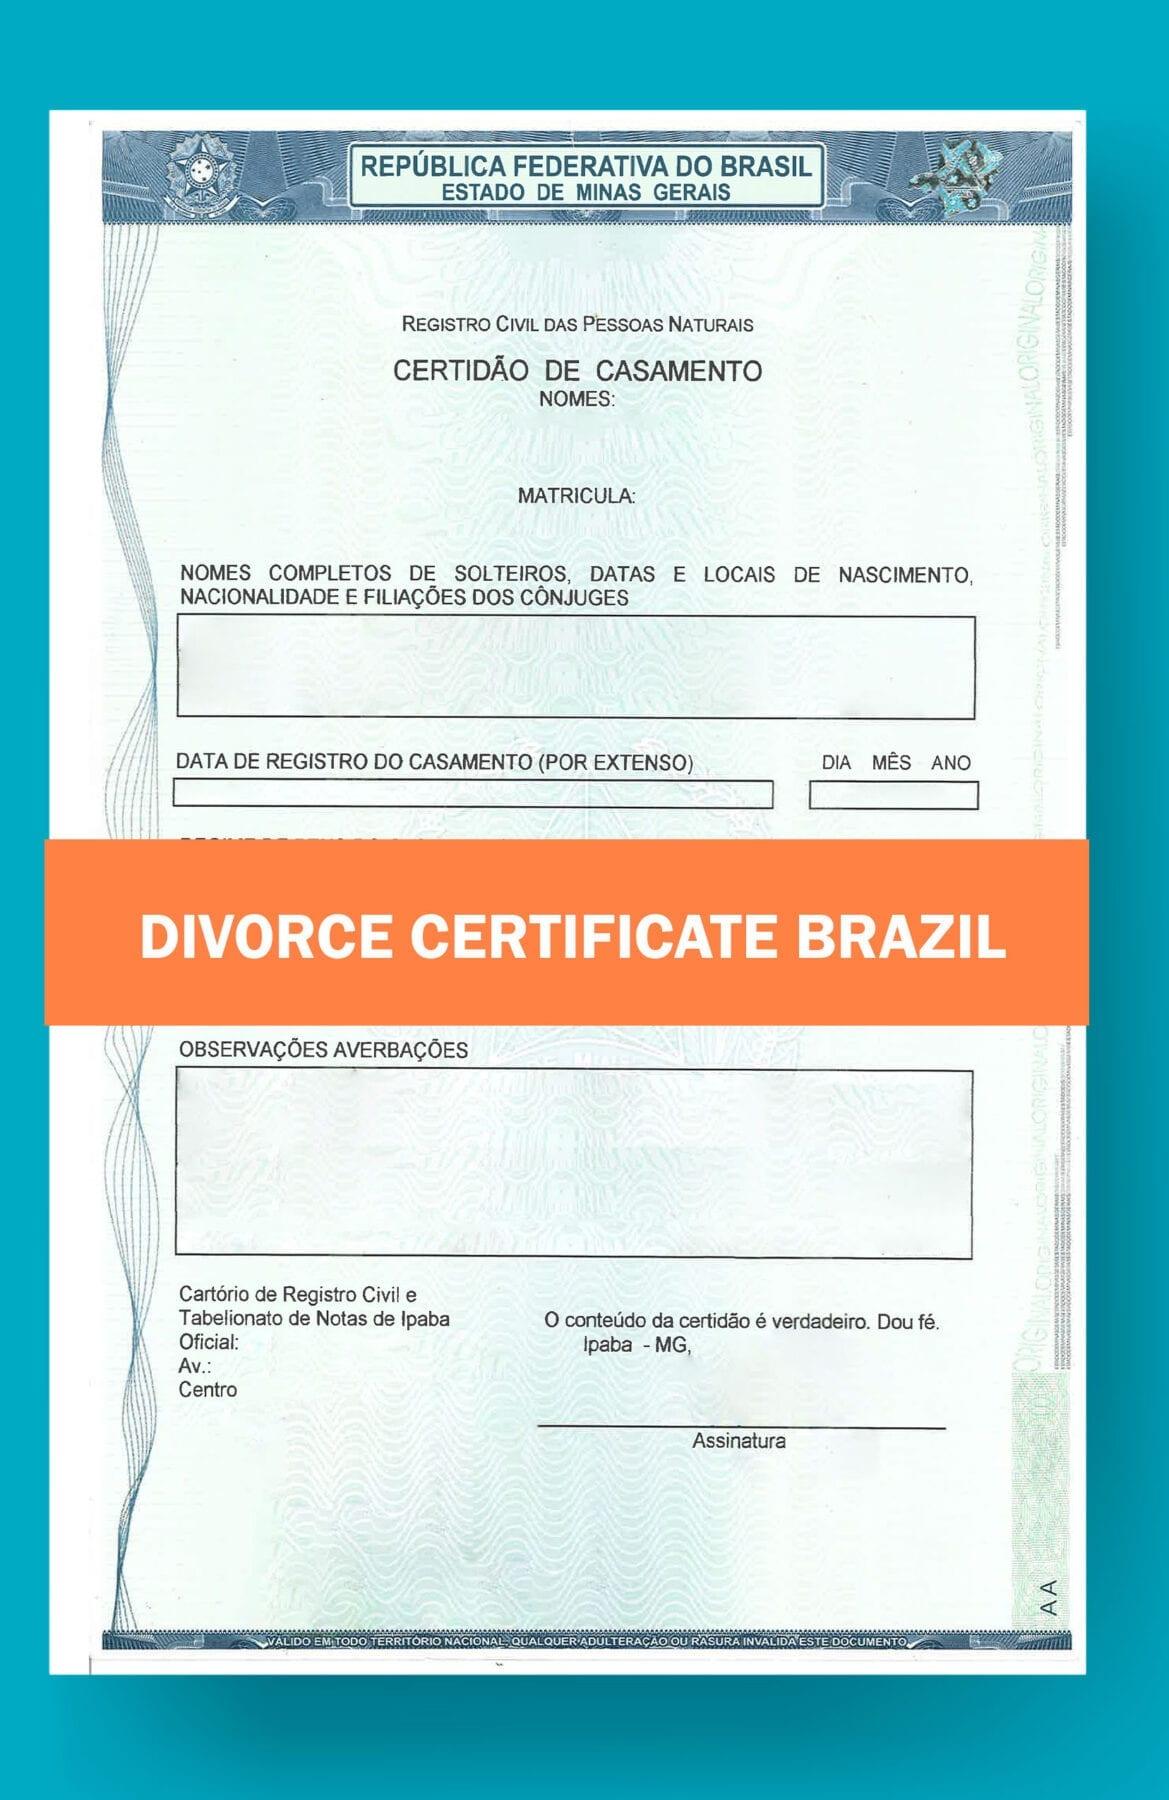 DIVORCE-CERTIFICATE-TEMPLATE-BRAZIL